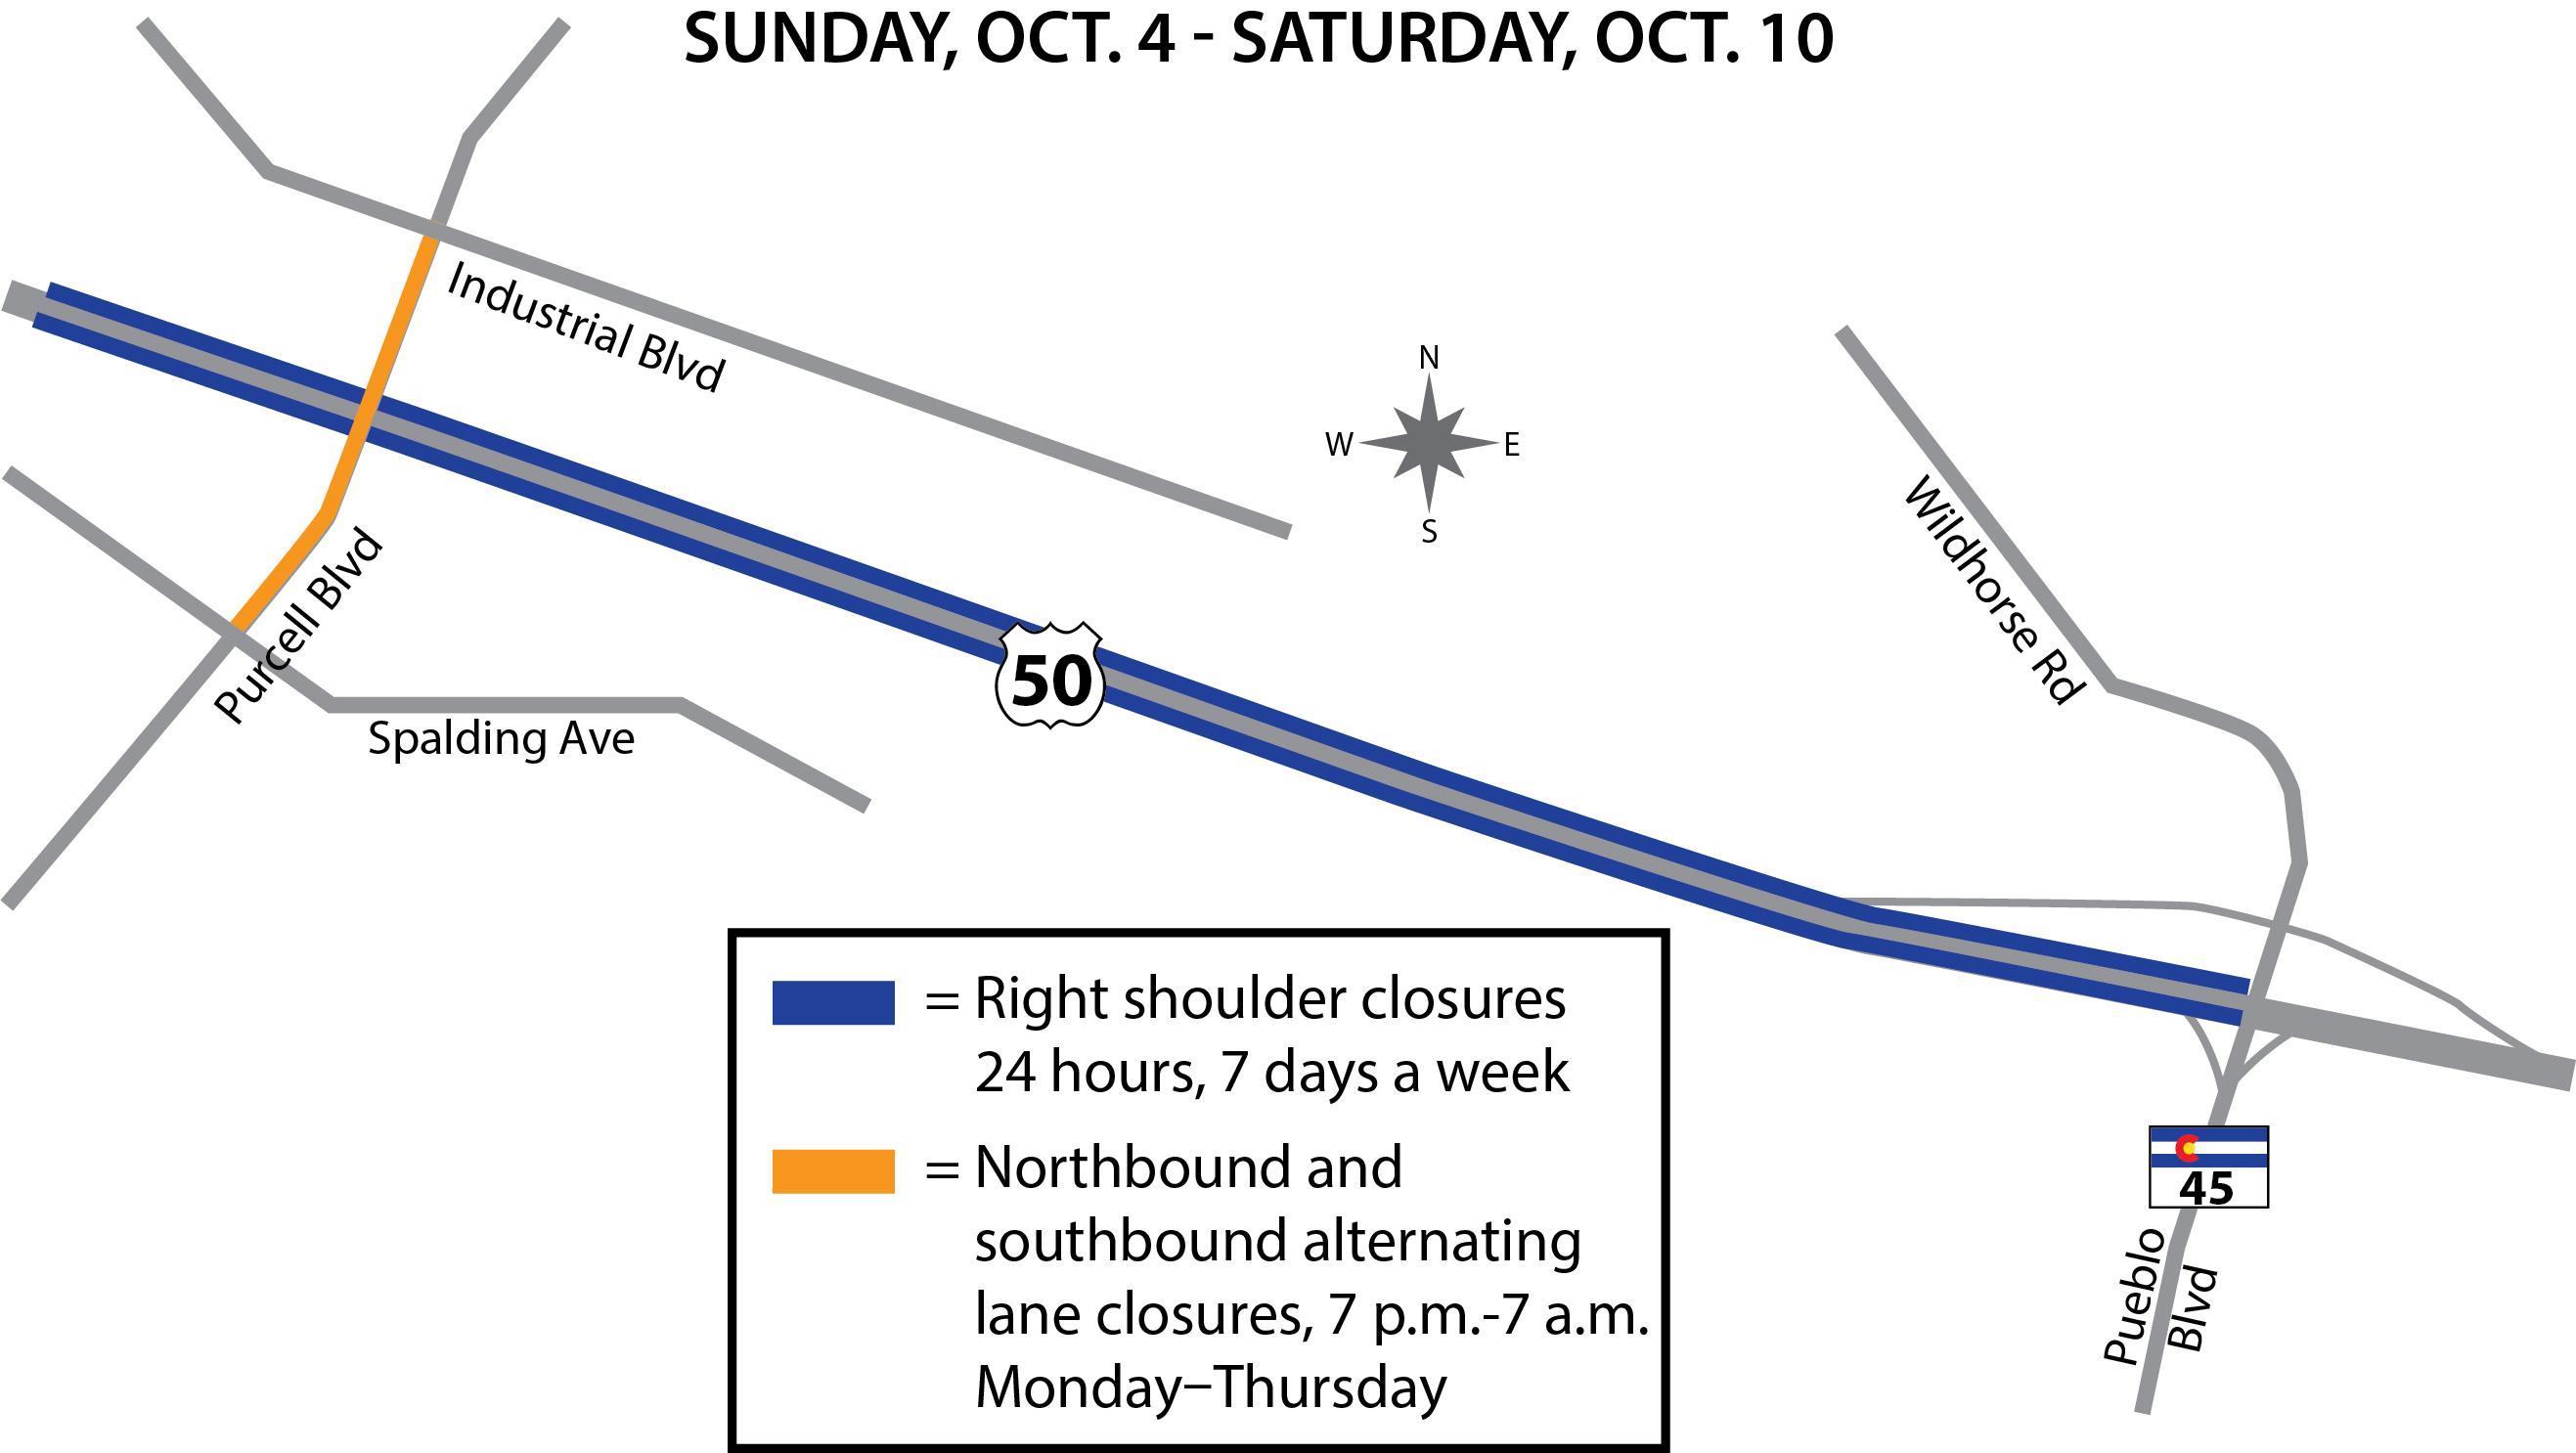 US 50 Purcell TrafficAdv map Oct4.jpg detail image